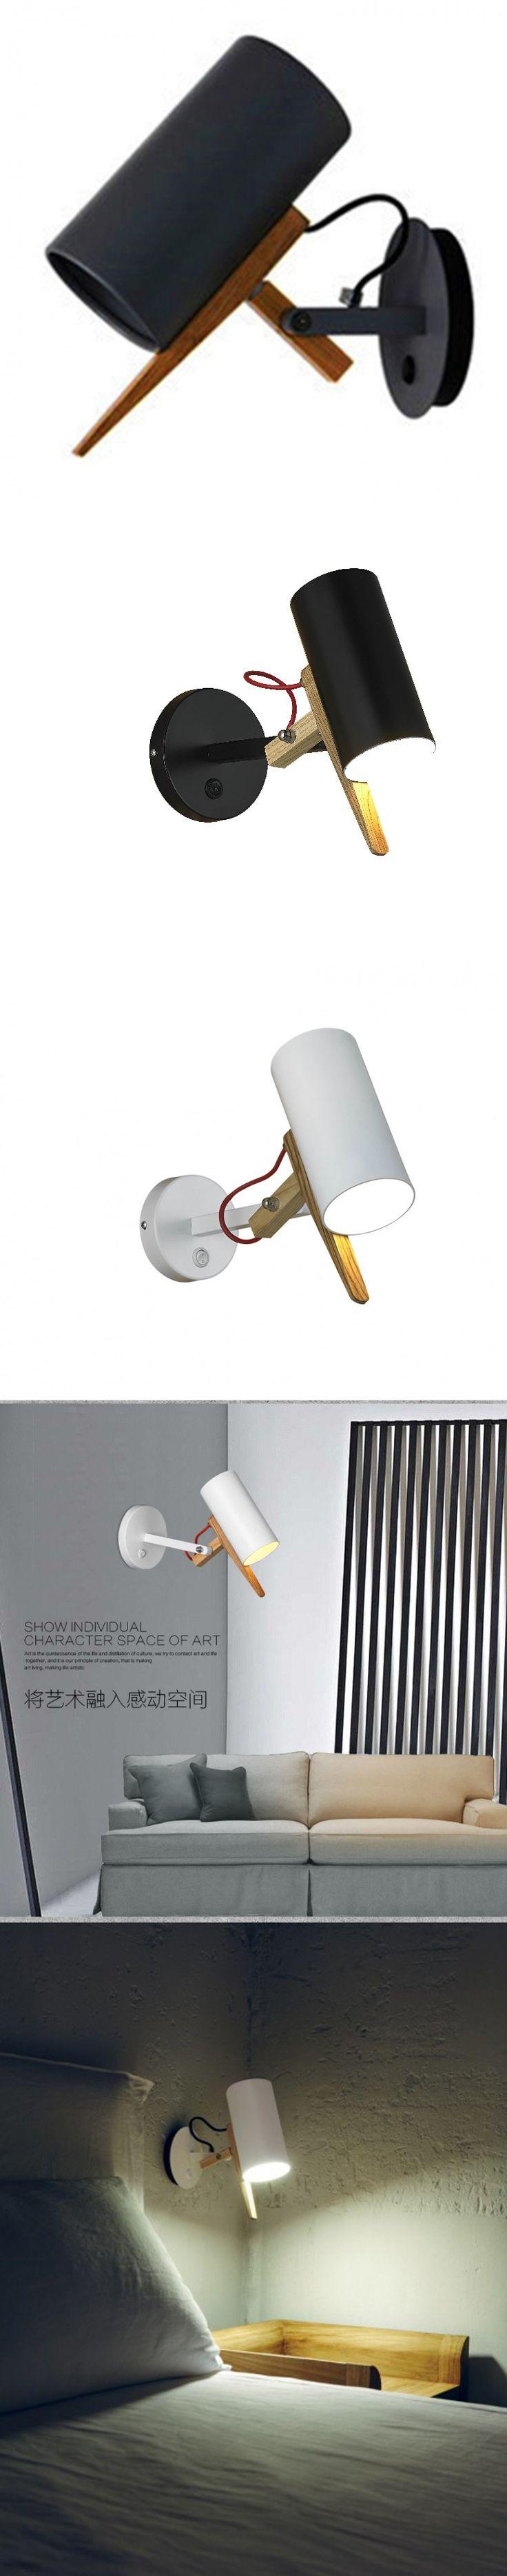 d656c990bd0cdbf6b88d98cc62aceec0--wall-lamps-wall-sconces Faszinierend System Led Lichterketten Außen Dekorationen